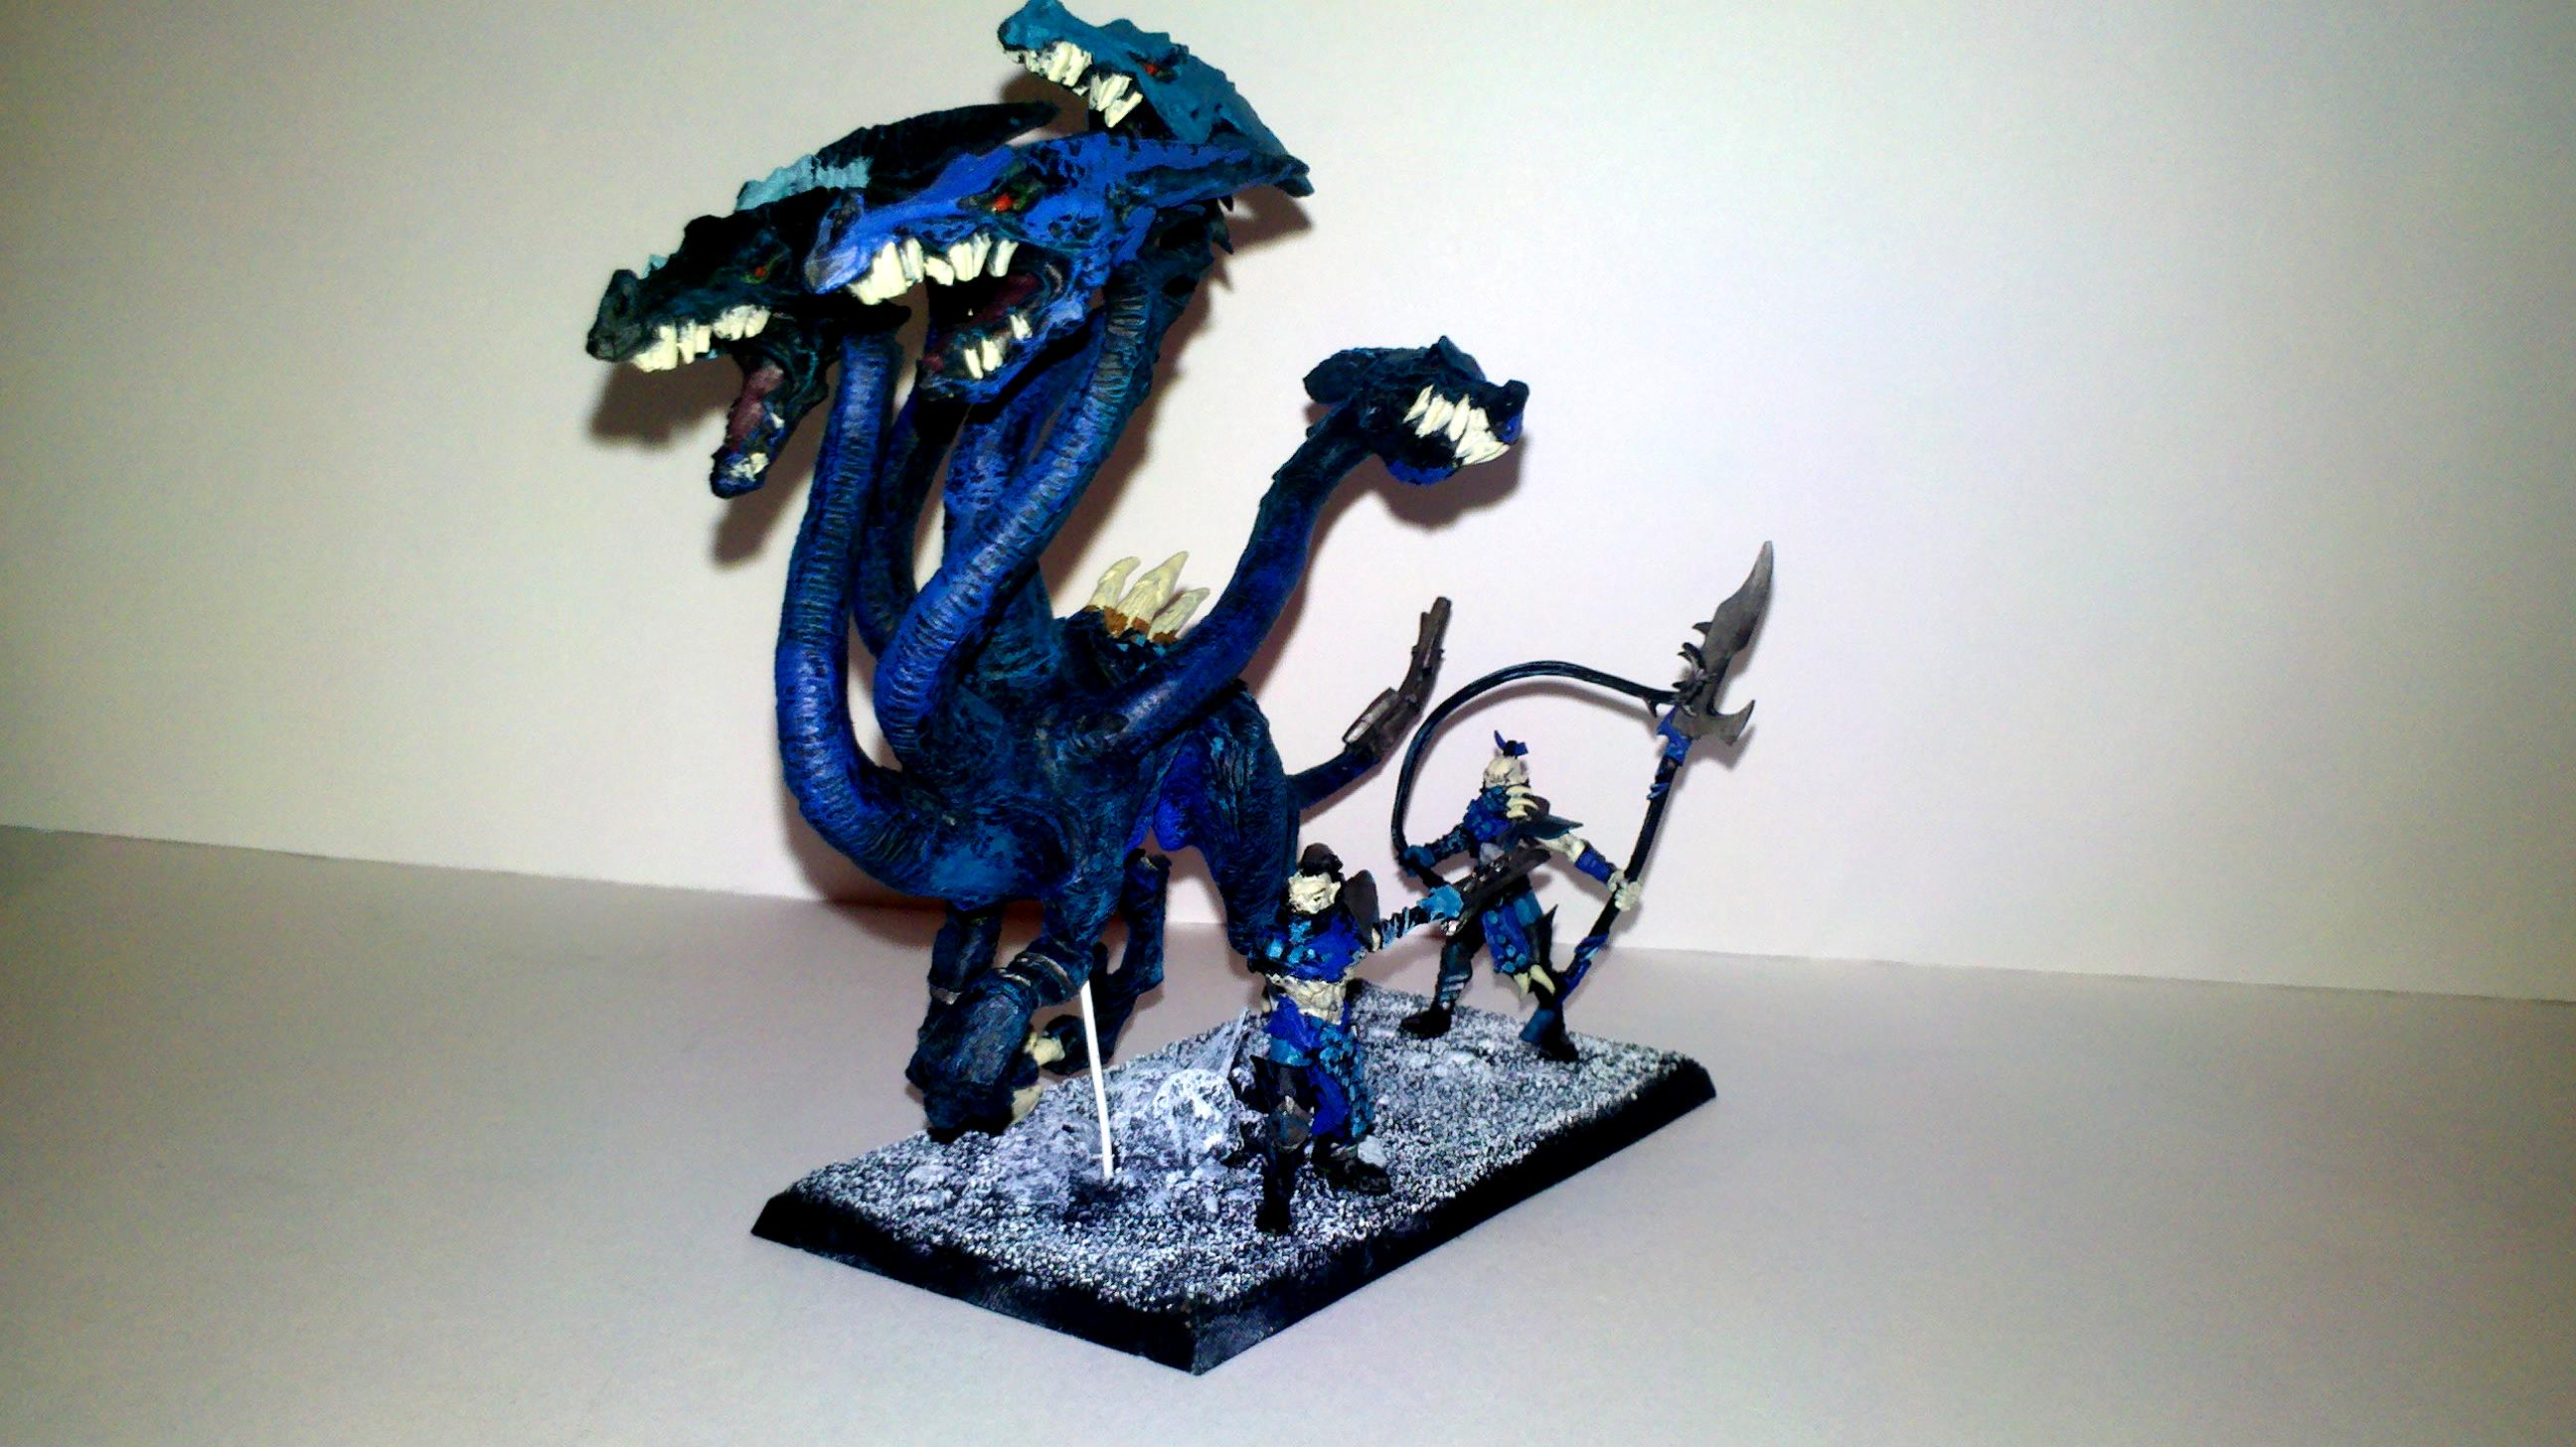 Black, Blackguard, Chariot, Cold, Cold Ones, Dark, Elves, Guard, Horse, Hydra, One, Pegasus, Rider